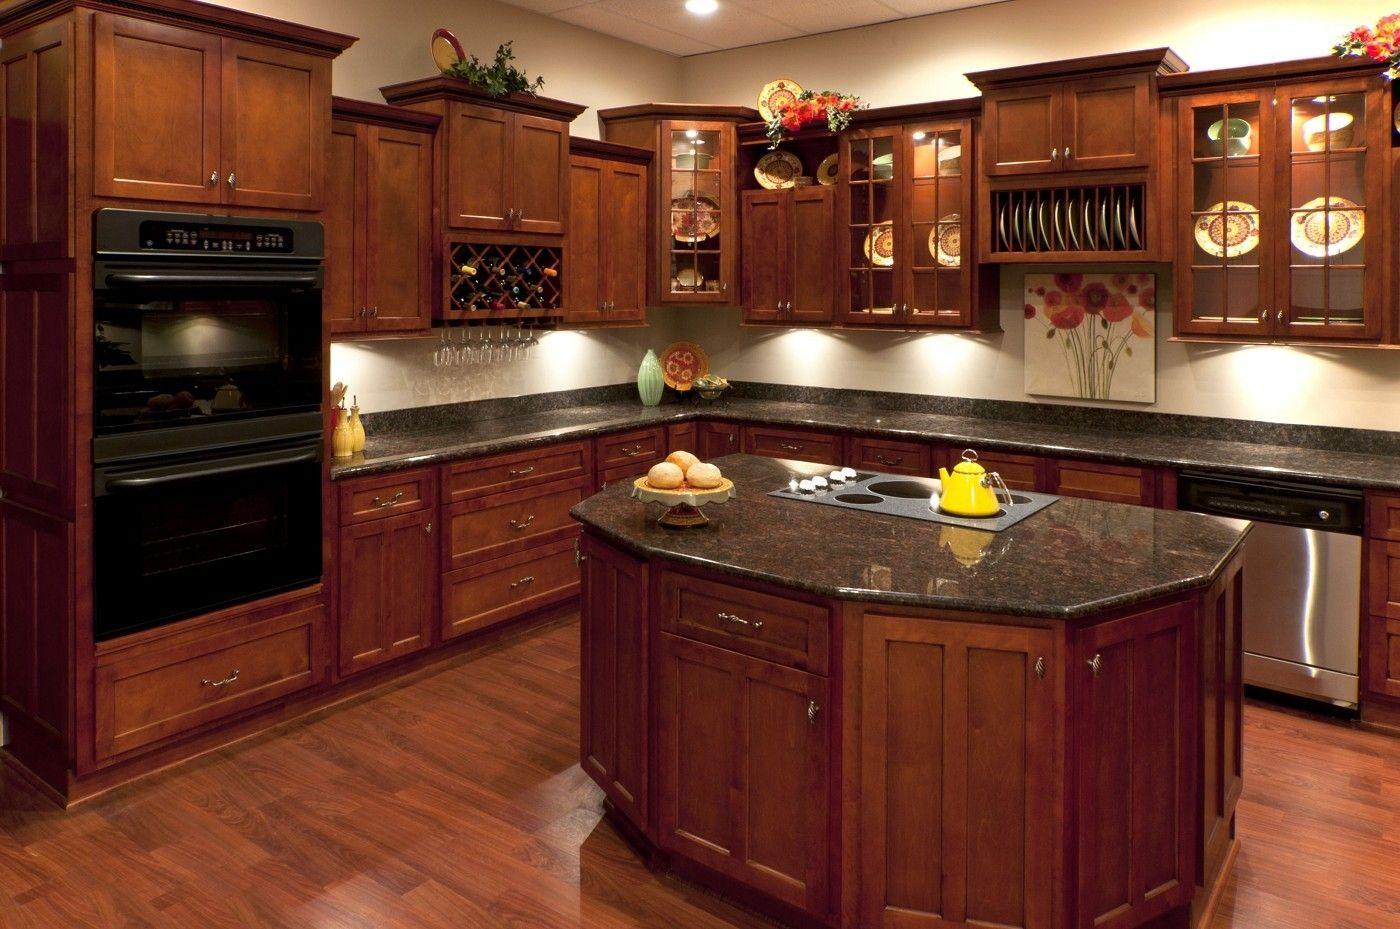 Image result for dark granite countertops Cherry wood